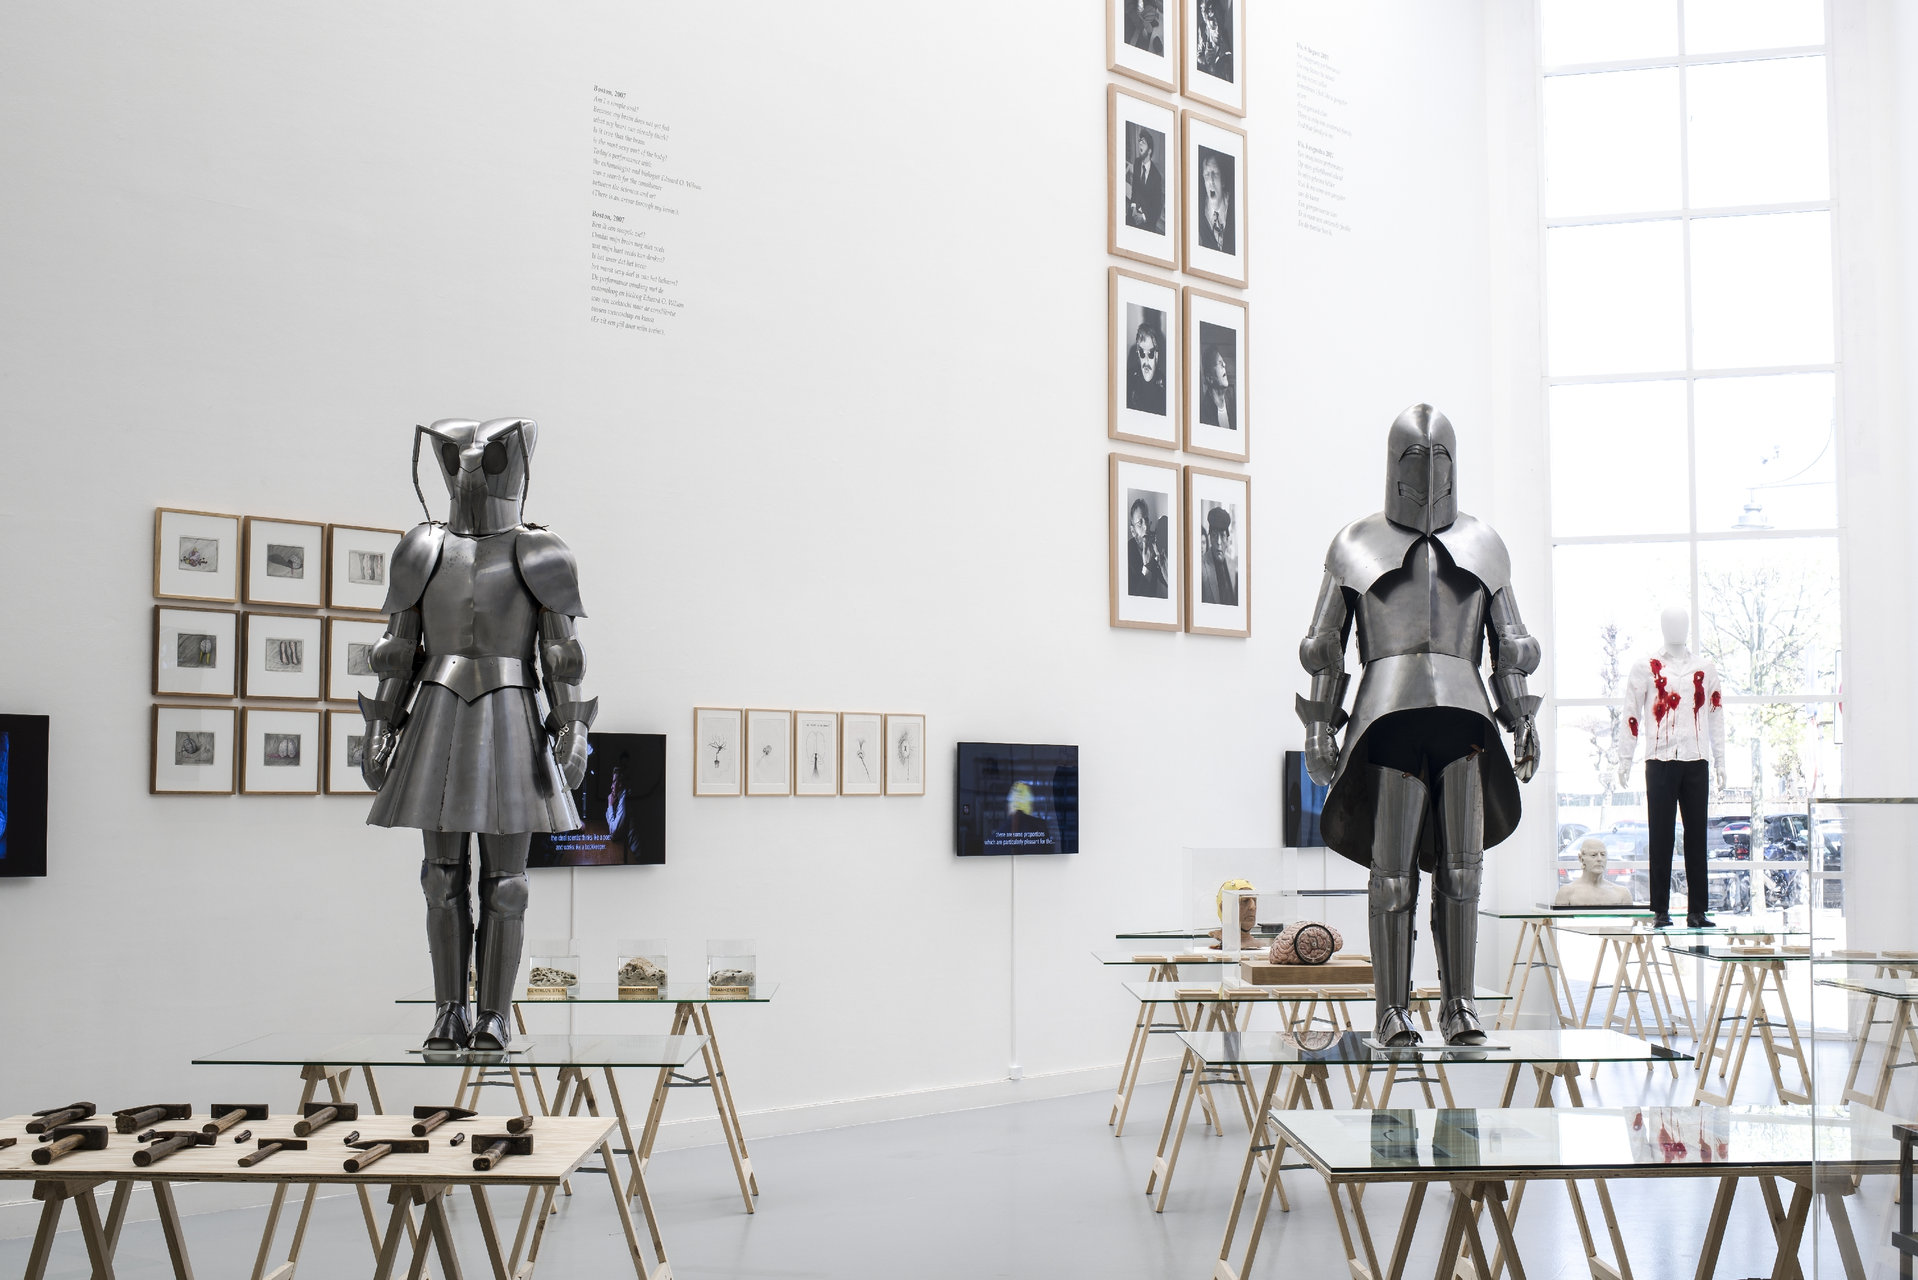 Jan_Fabre,_exhibition_view_M_HKA_2015_photo_M_HKAclinckx14